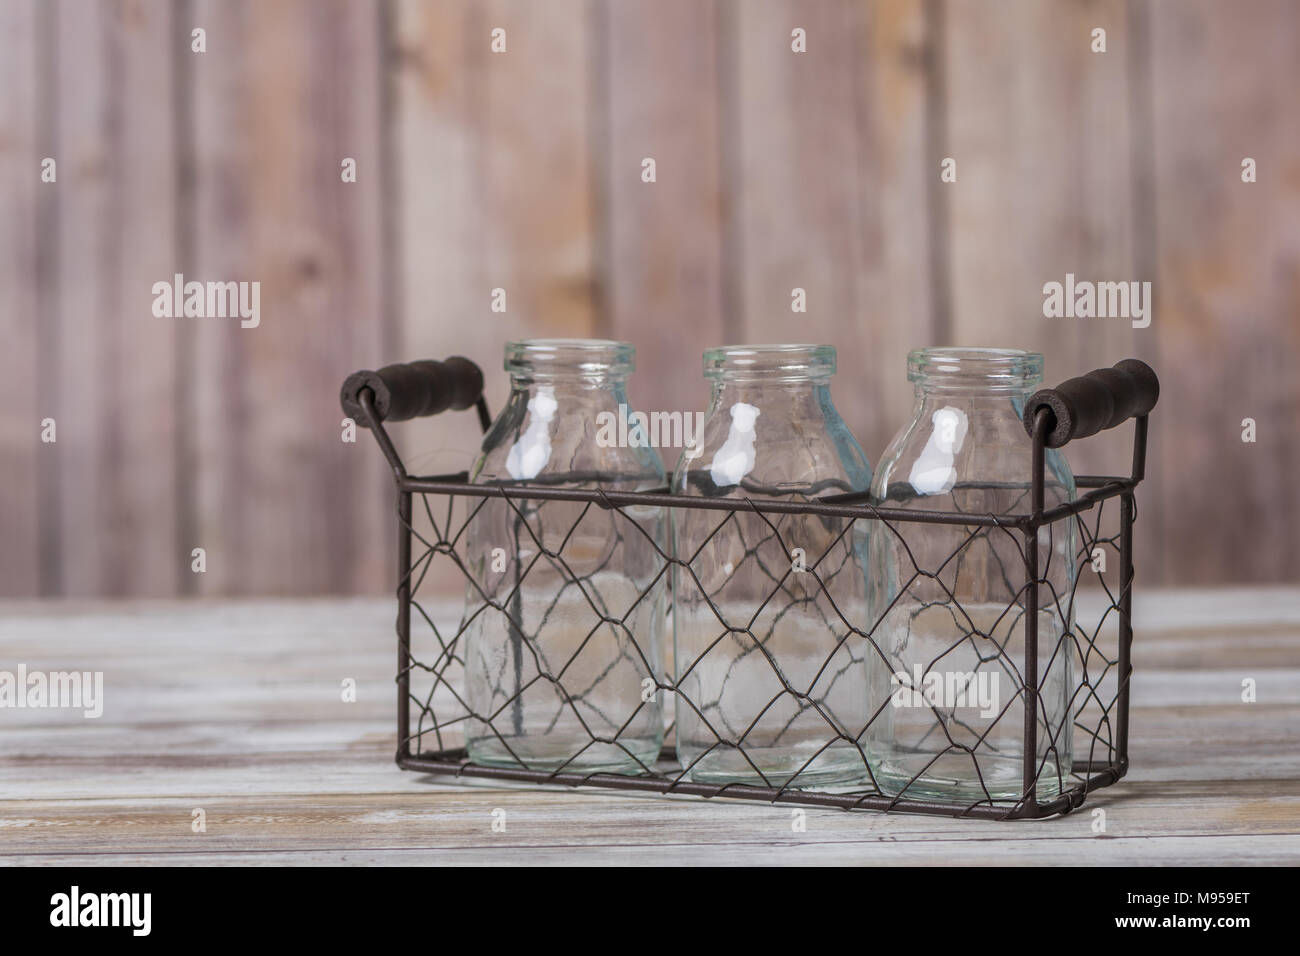 Vintage milk bottles in a wire basket carrier Stock Photo: 177752816 ...